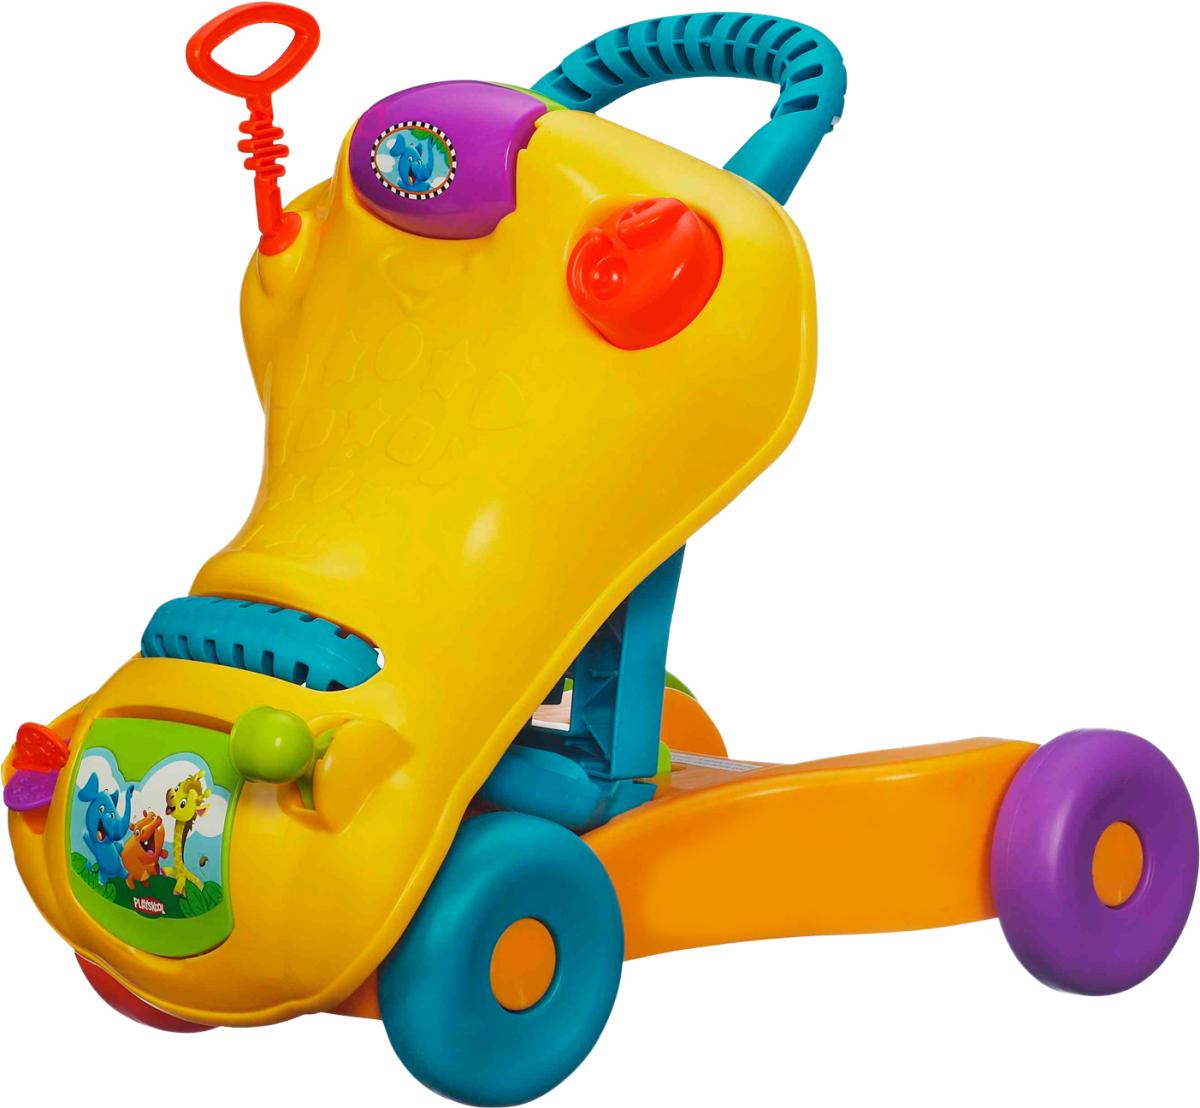 Каталка-трансформер Hasbro Playskool Ходунок 05545 SotMarket.ru 2200.000